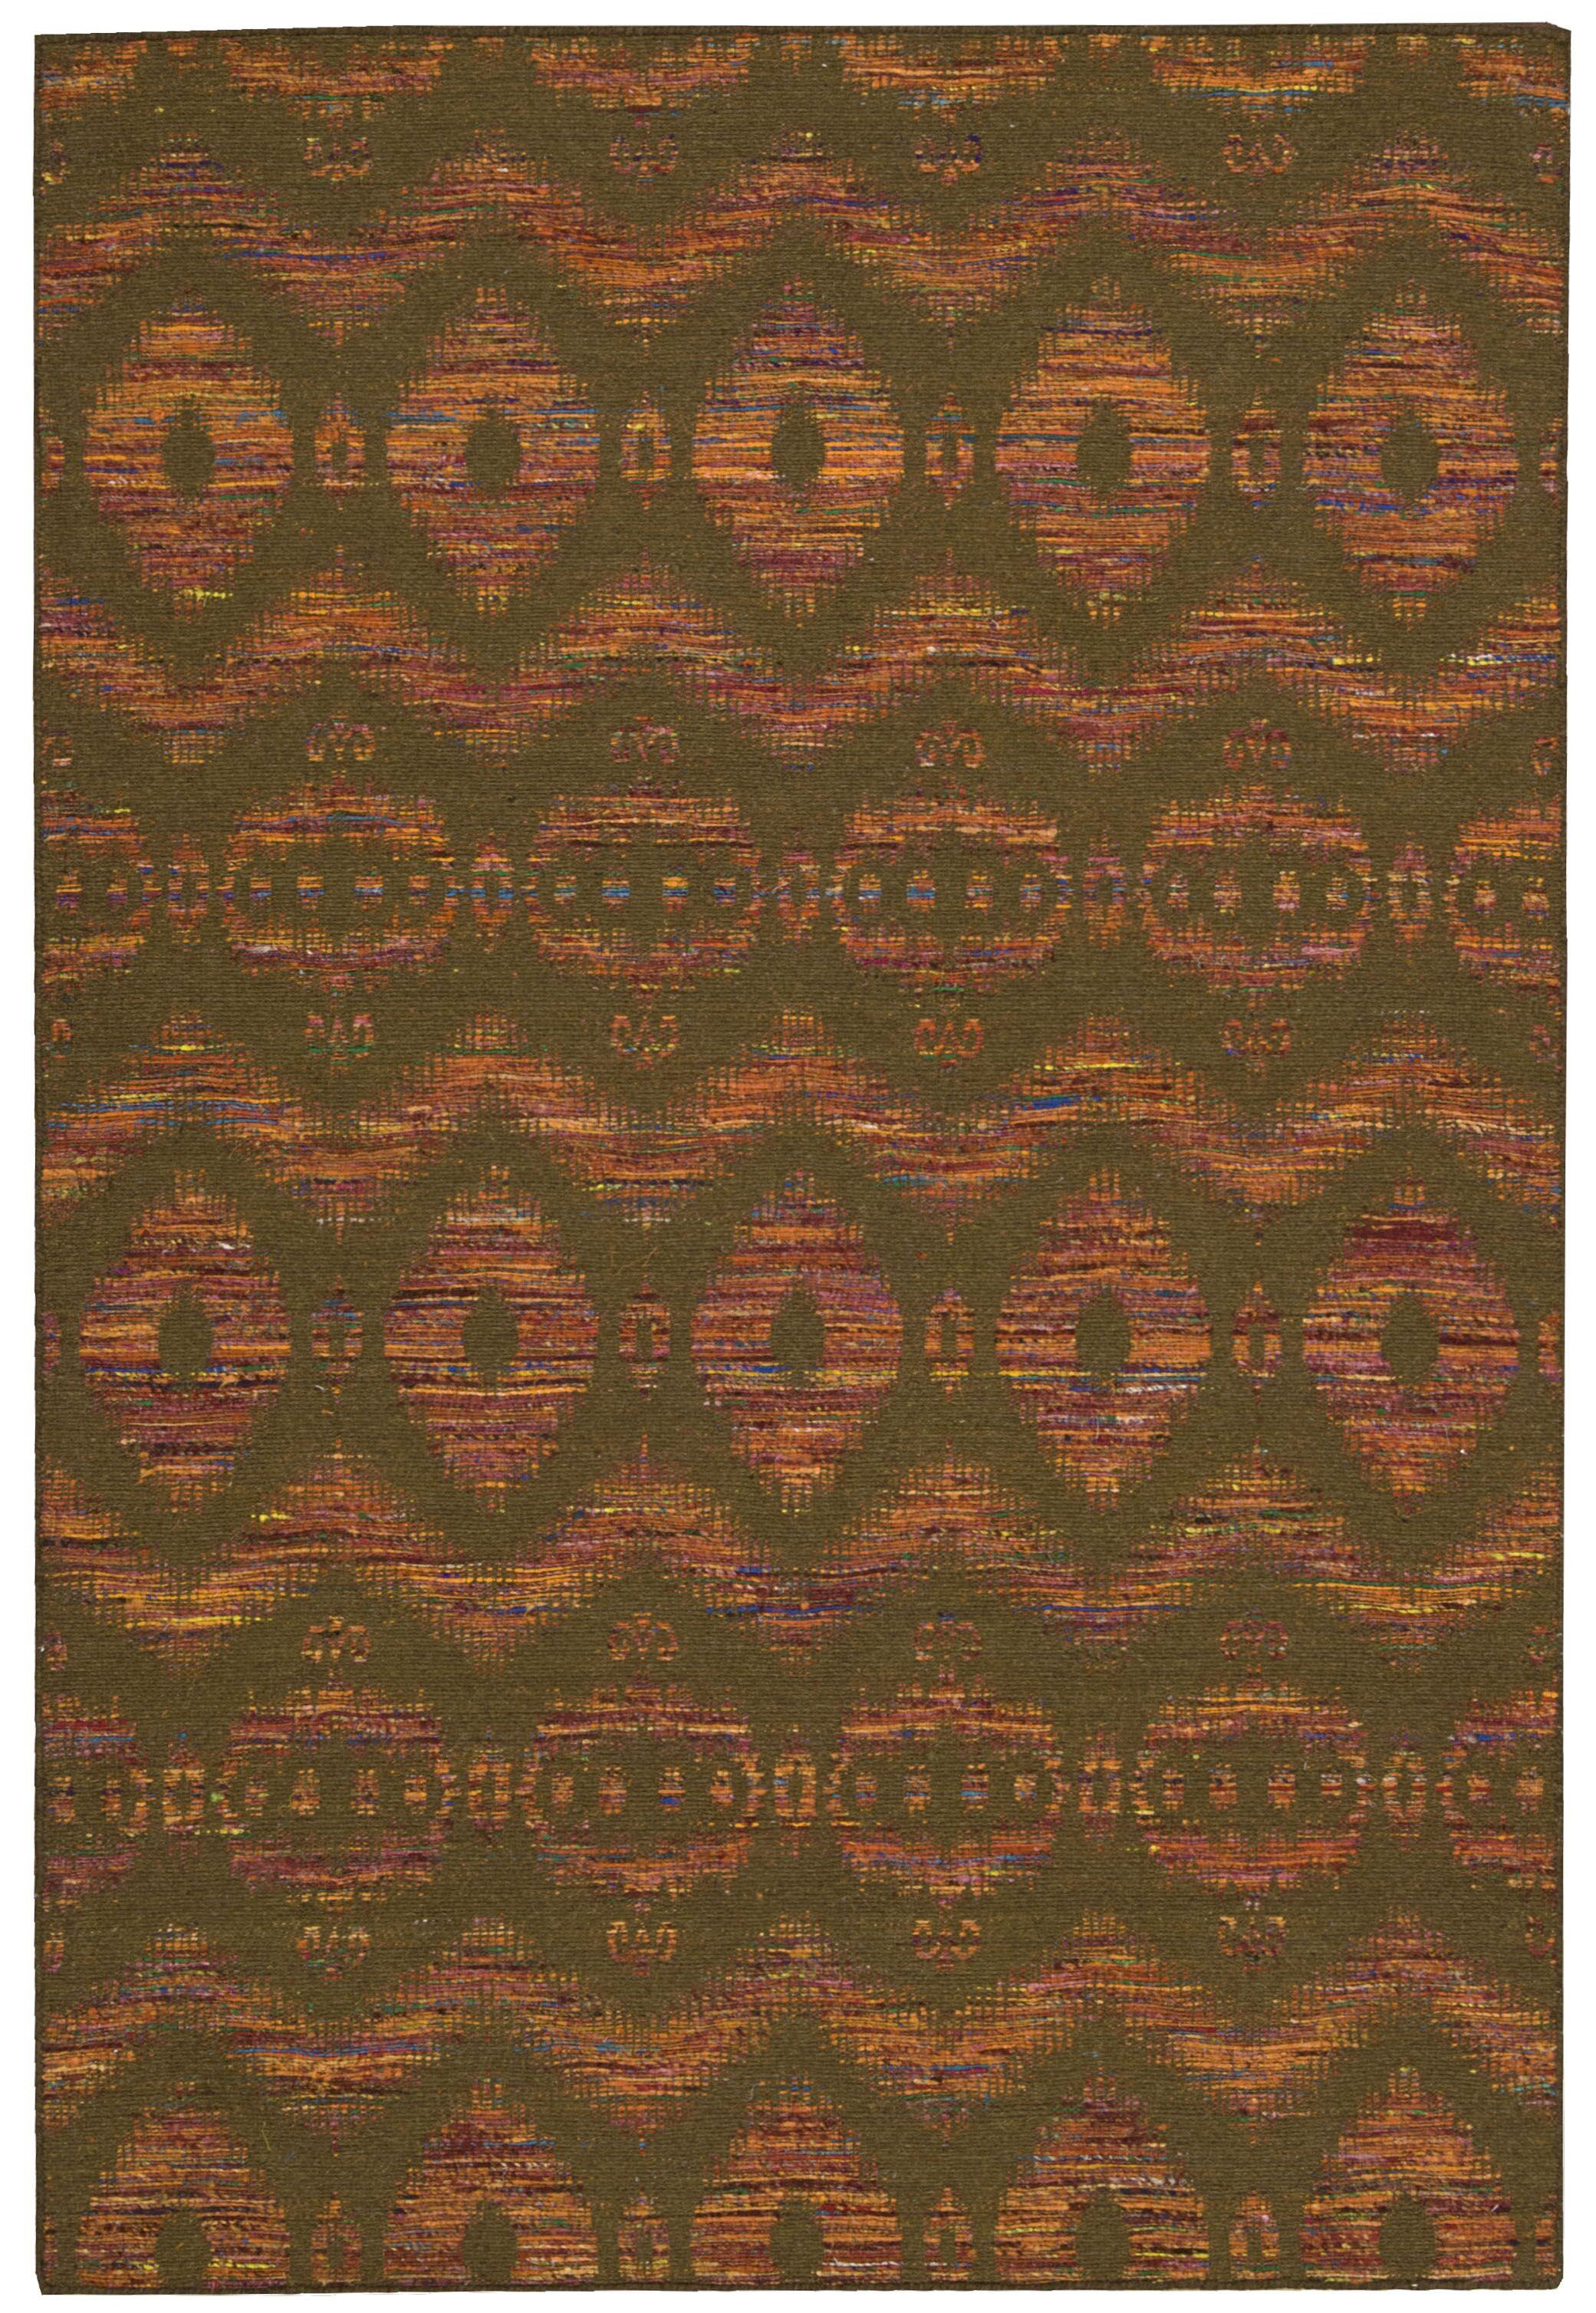 Pine Grove Hand-Woven Flame/Chocolate Area Rug Rug Size: Rectangle 5'3